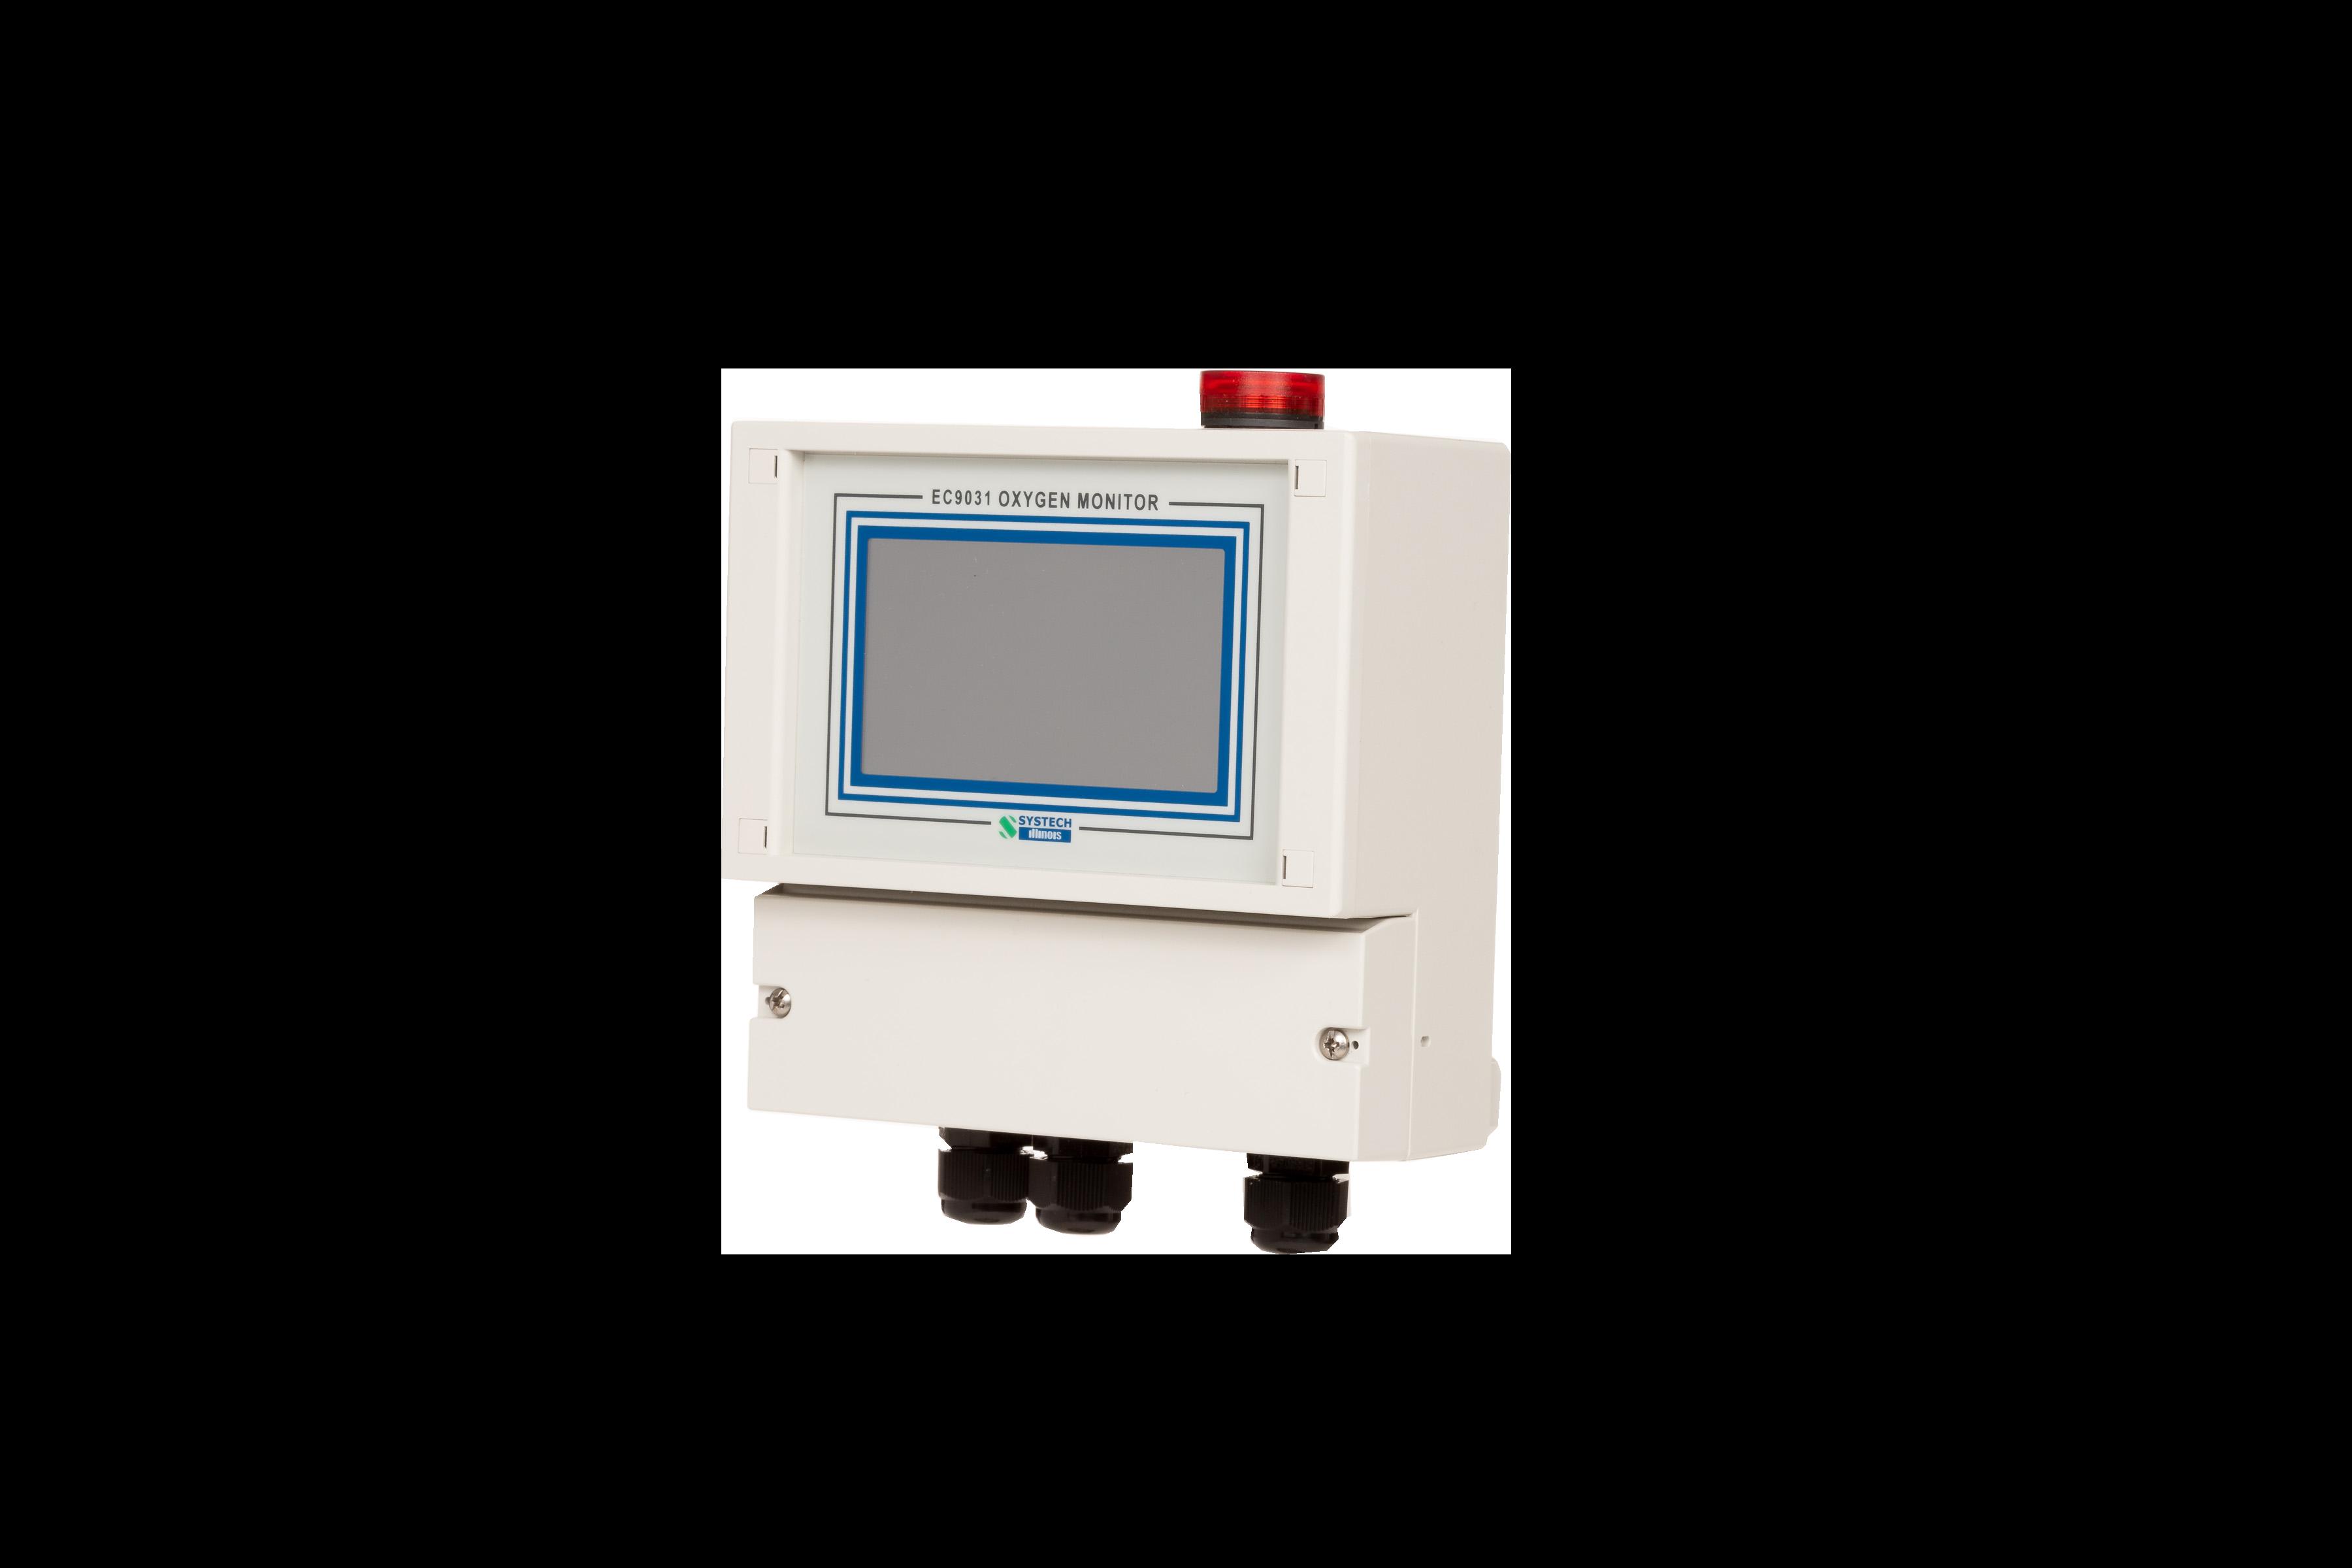 Systech Illinois - EC9031-Oxygen monitor